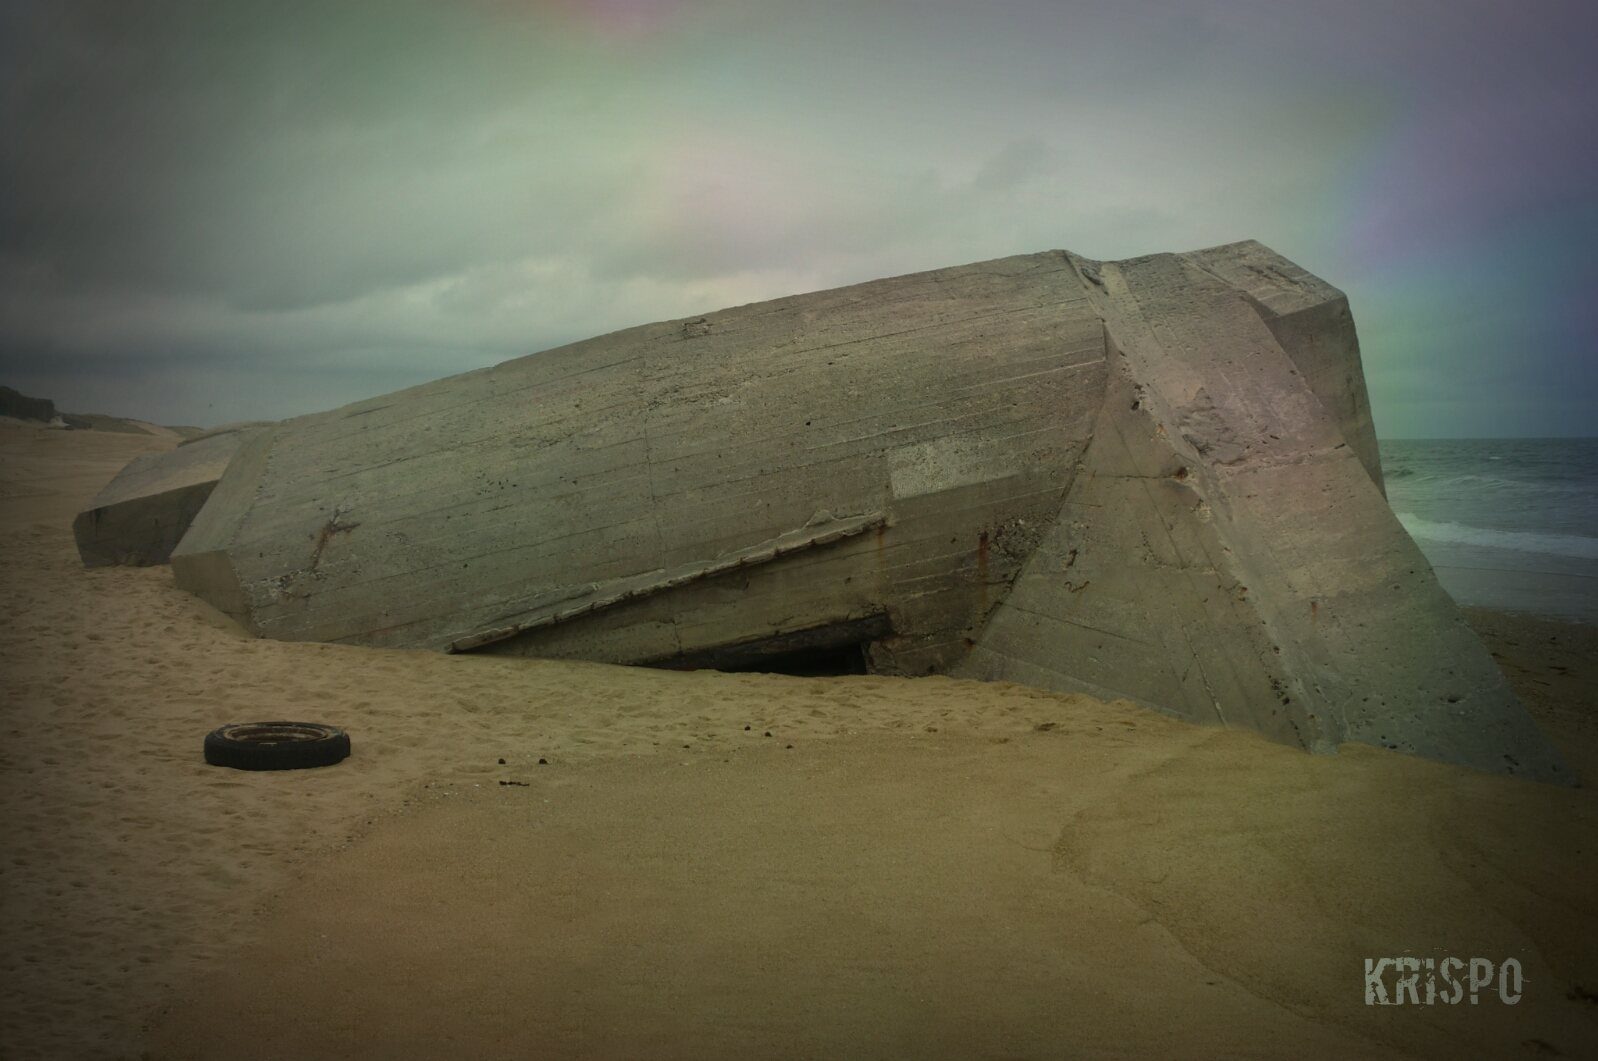 detalle de bunker enterrado en playa de las landas